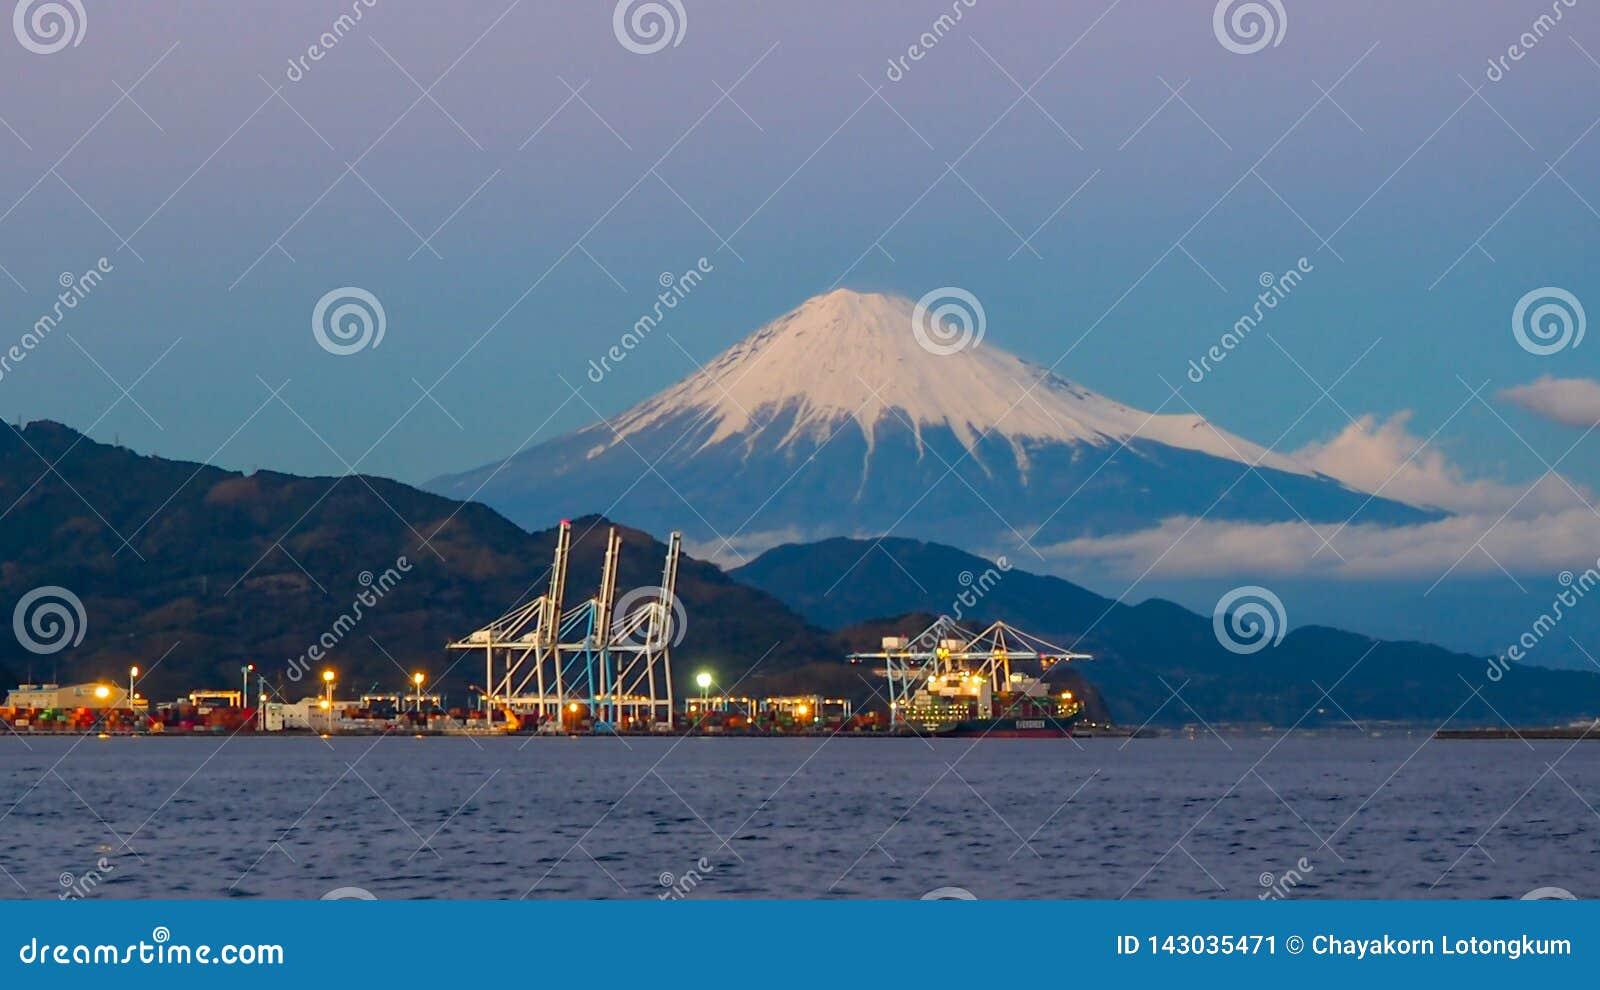 Mt. Fuji from Shizuoka, Japan